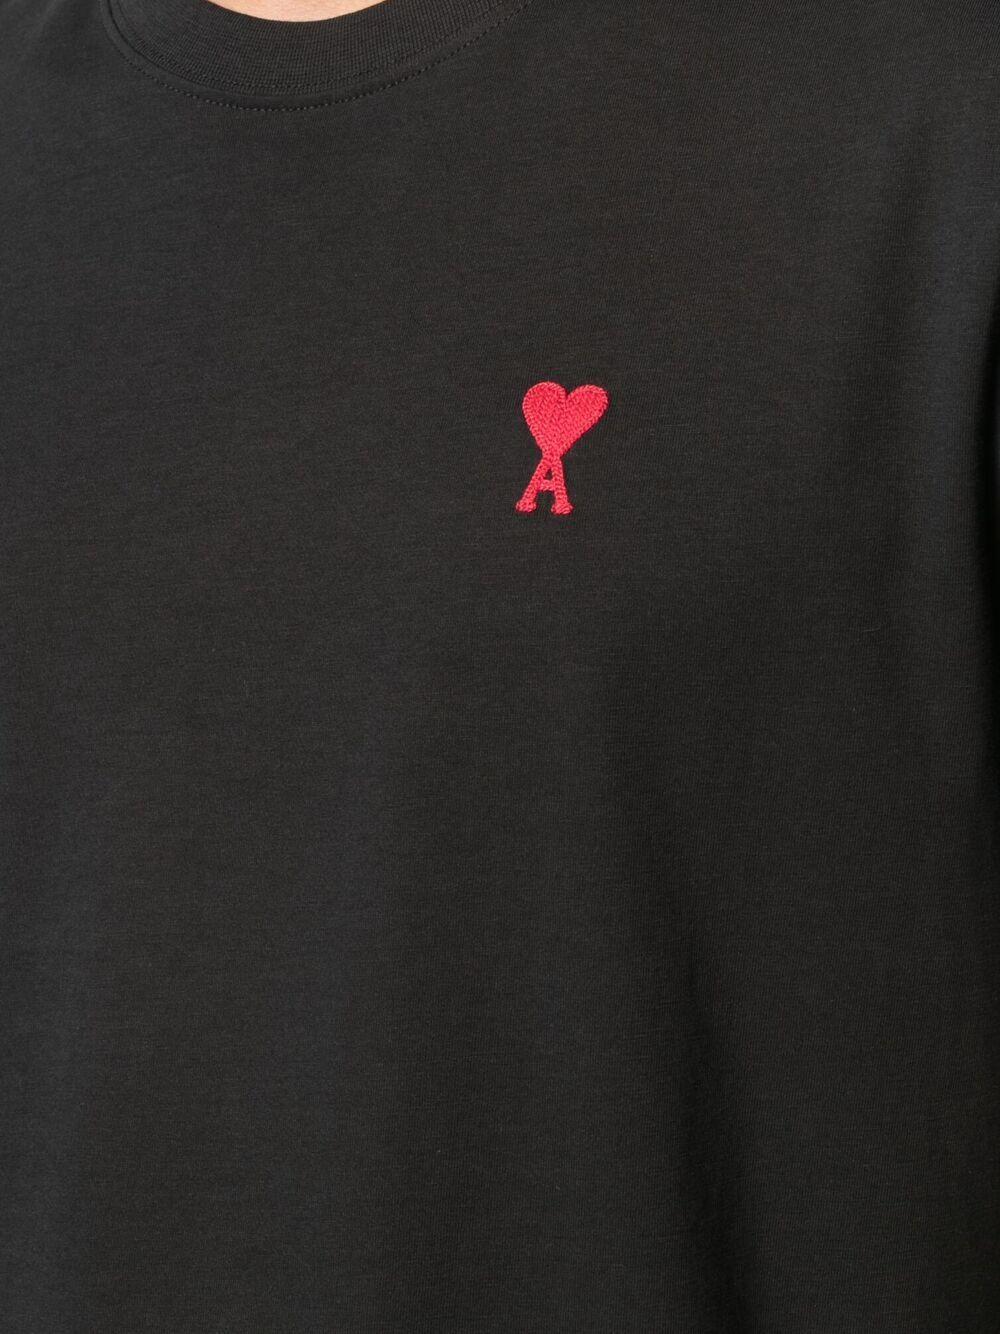 Ami de coeur t-shirt nera uomo organic cotton AMI - ALEXANDRE MATTIUSSI   T-shirts   BFHJ108.723001